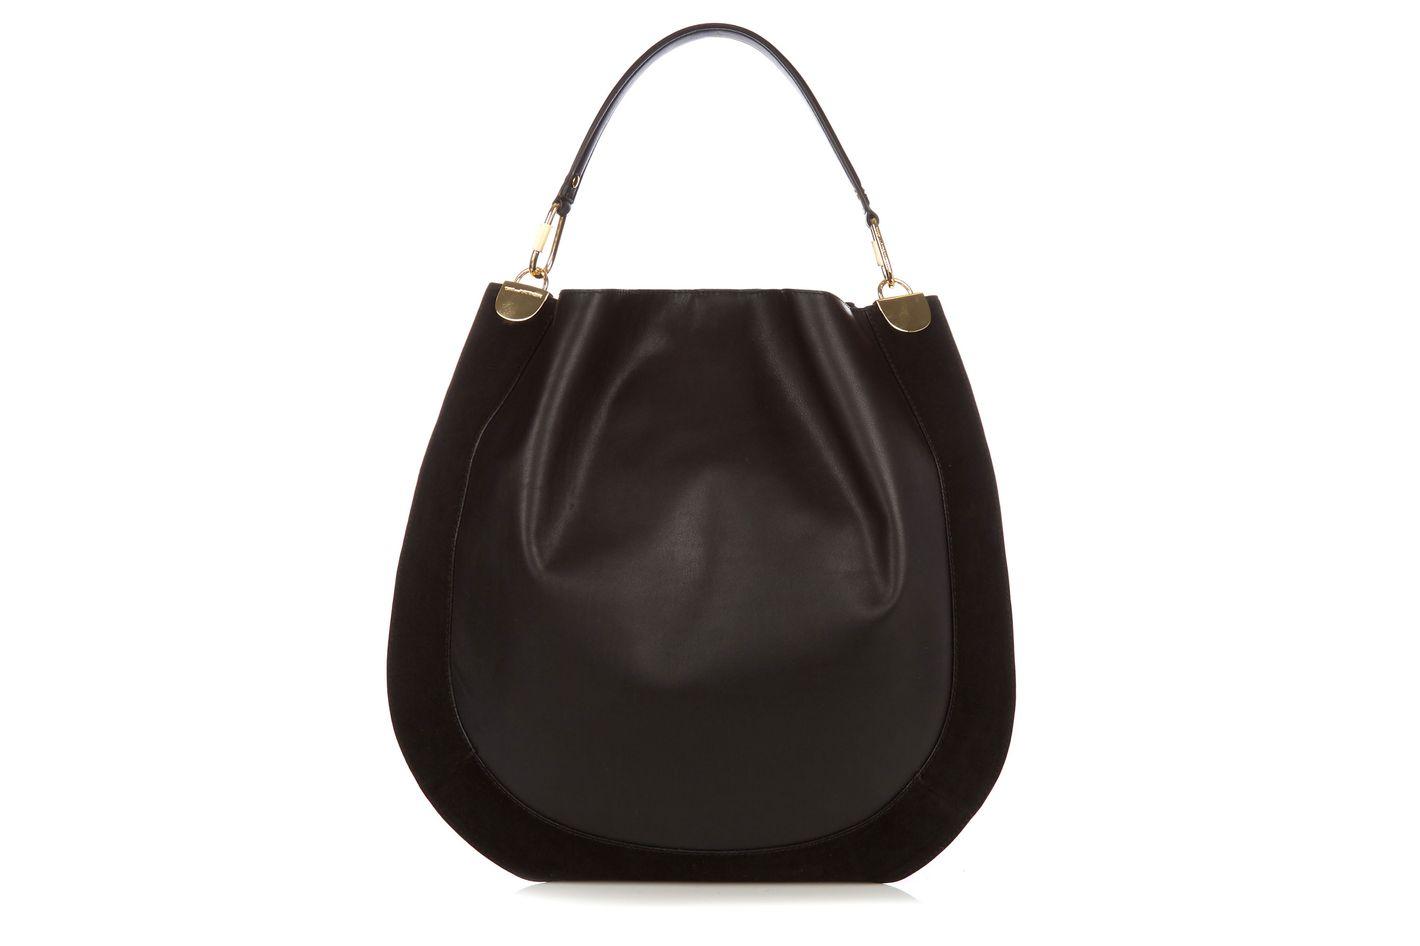 Diane von Furstenberg Moon Large Bag